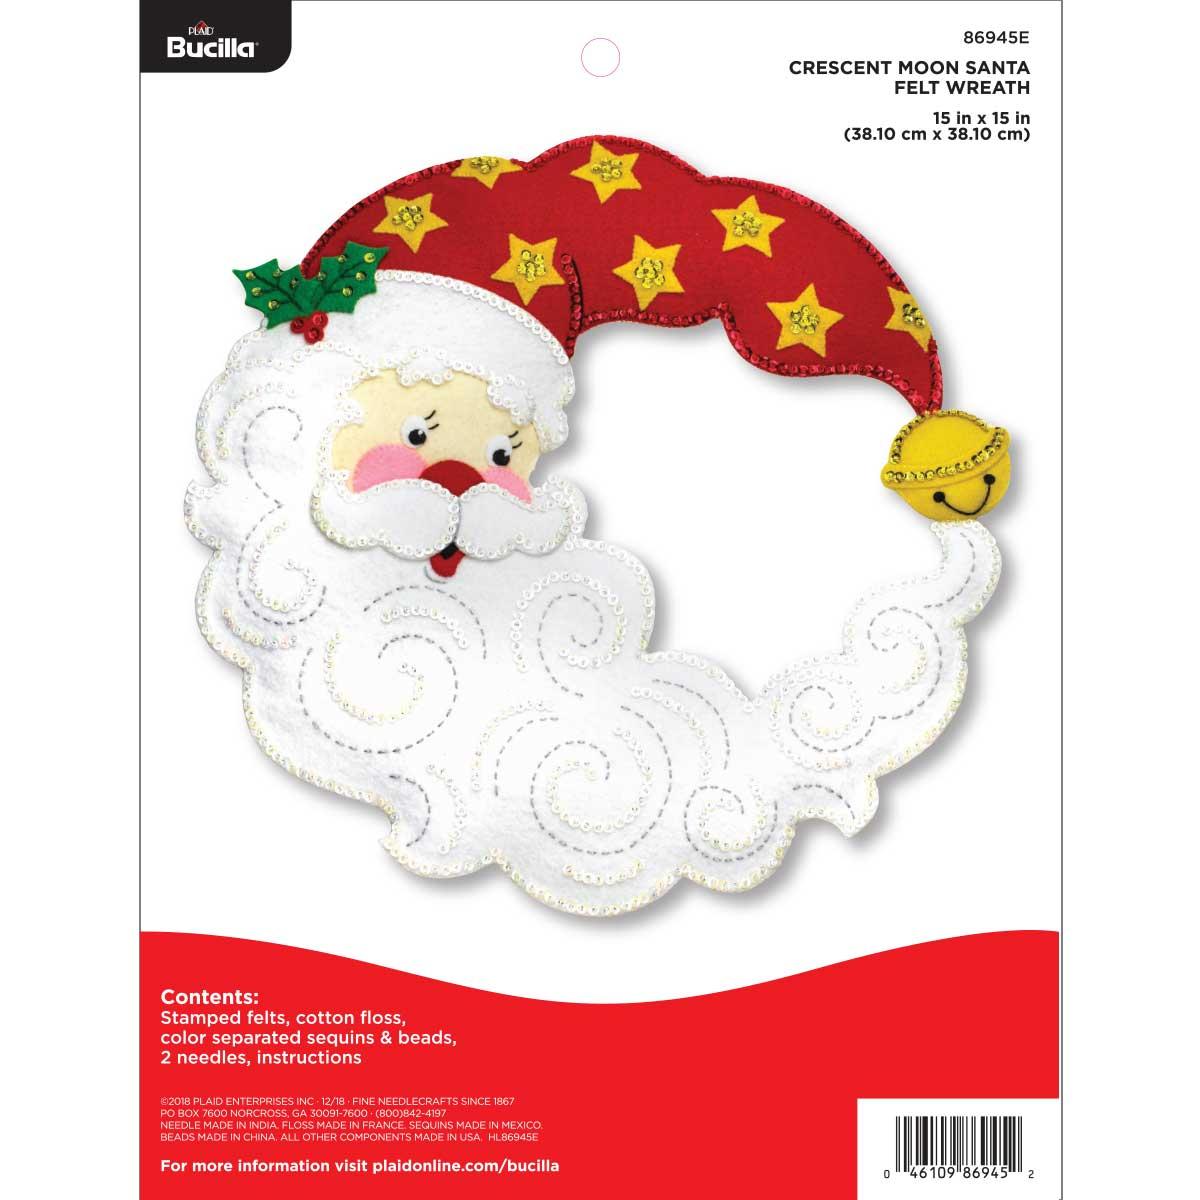 Bucilla ® Seasonal - Felt - Home Decor - Crescent Moon Santa Wreath - 86945E